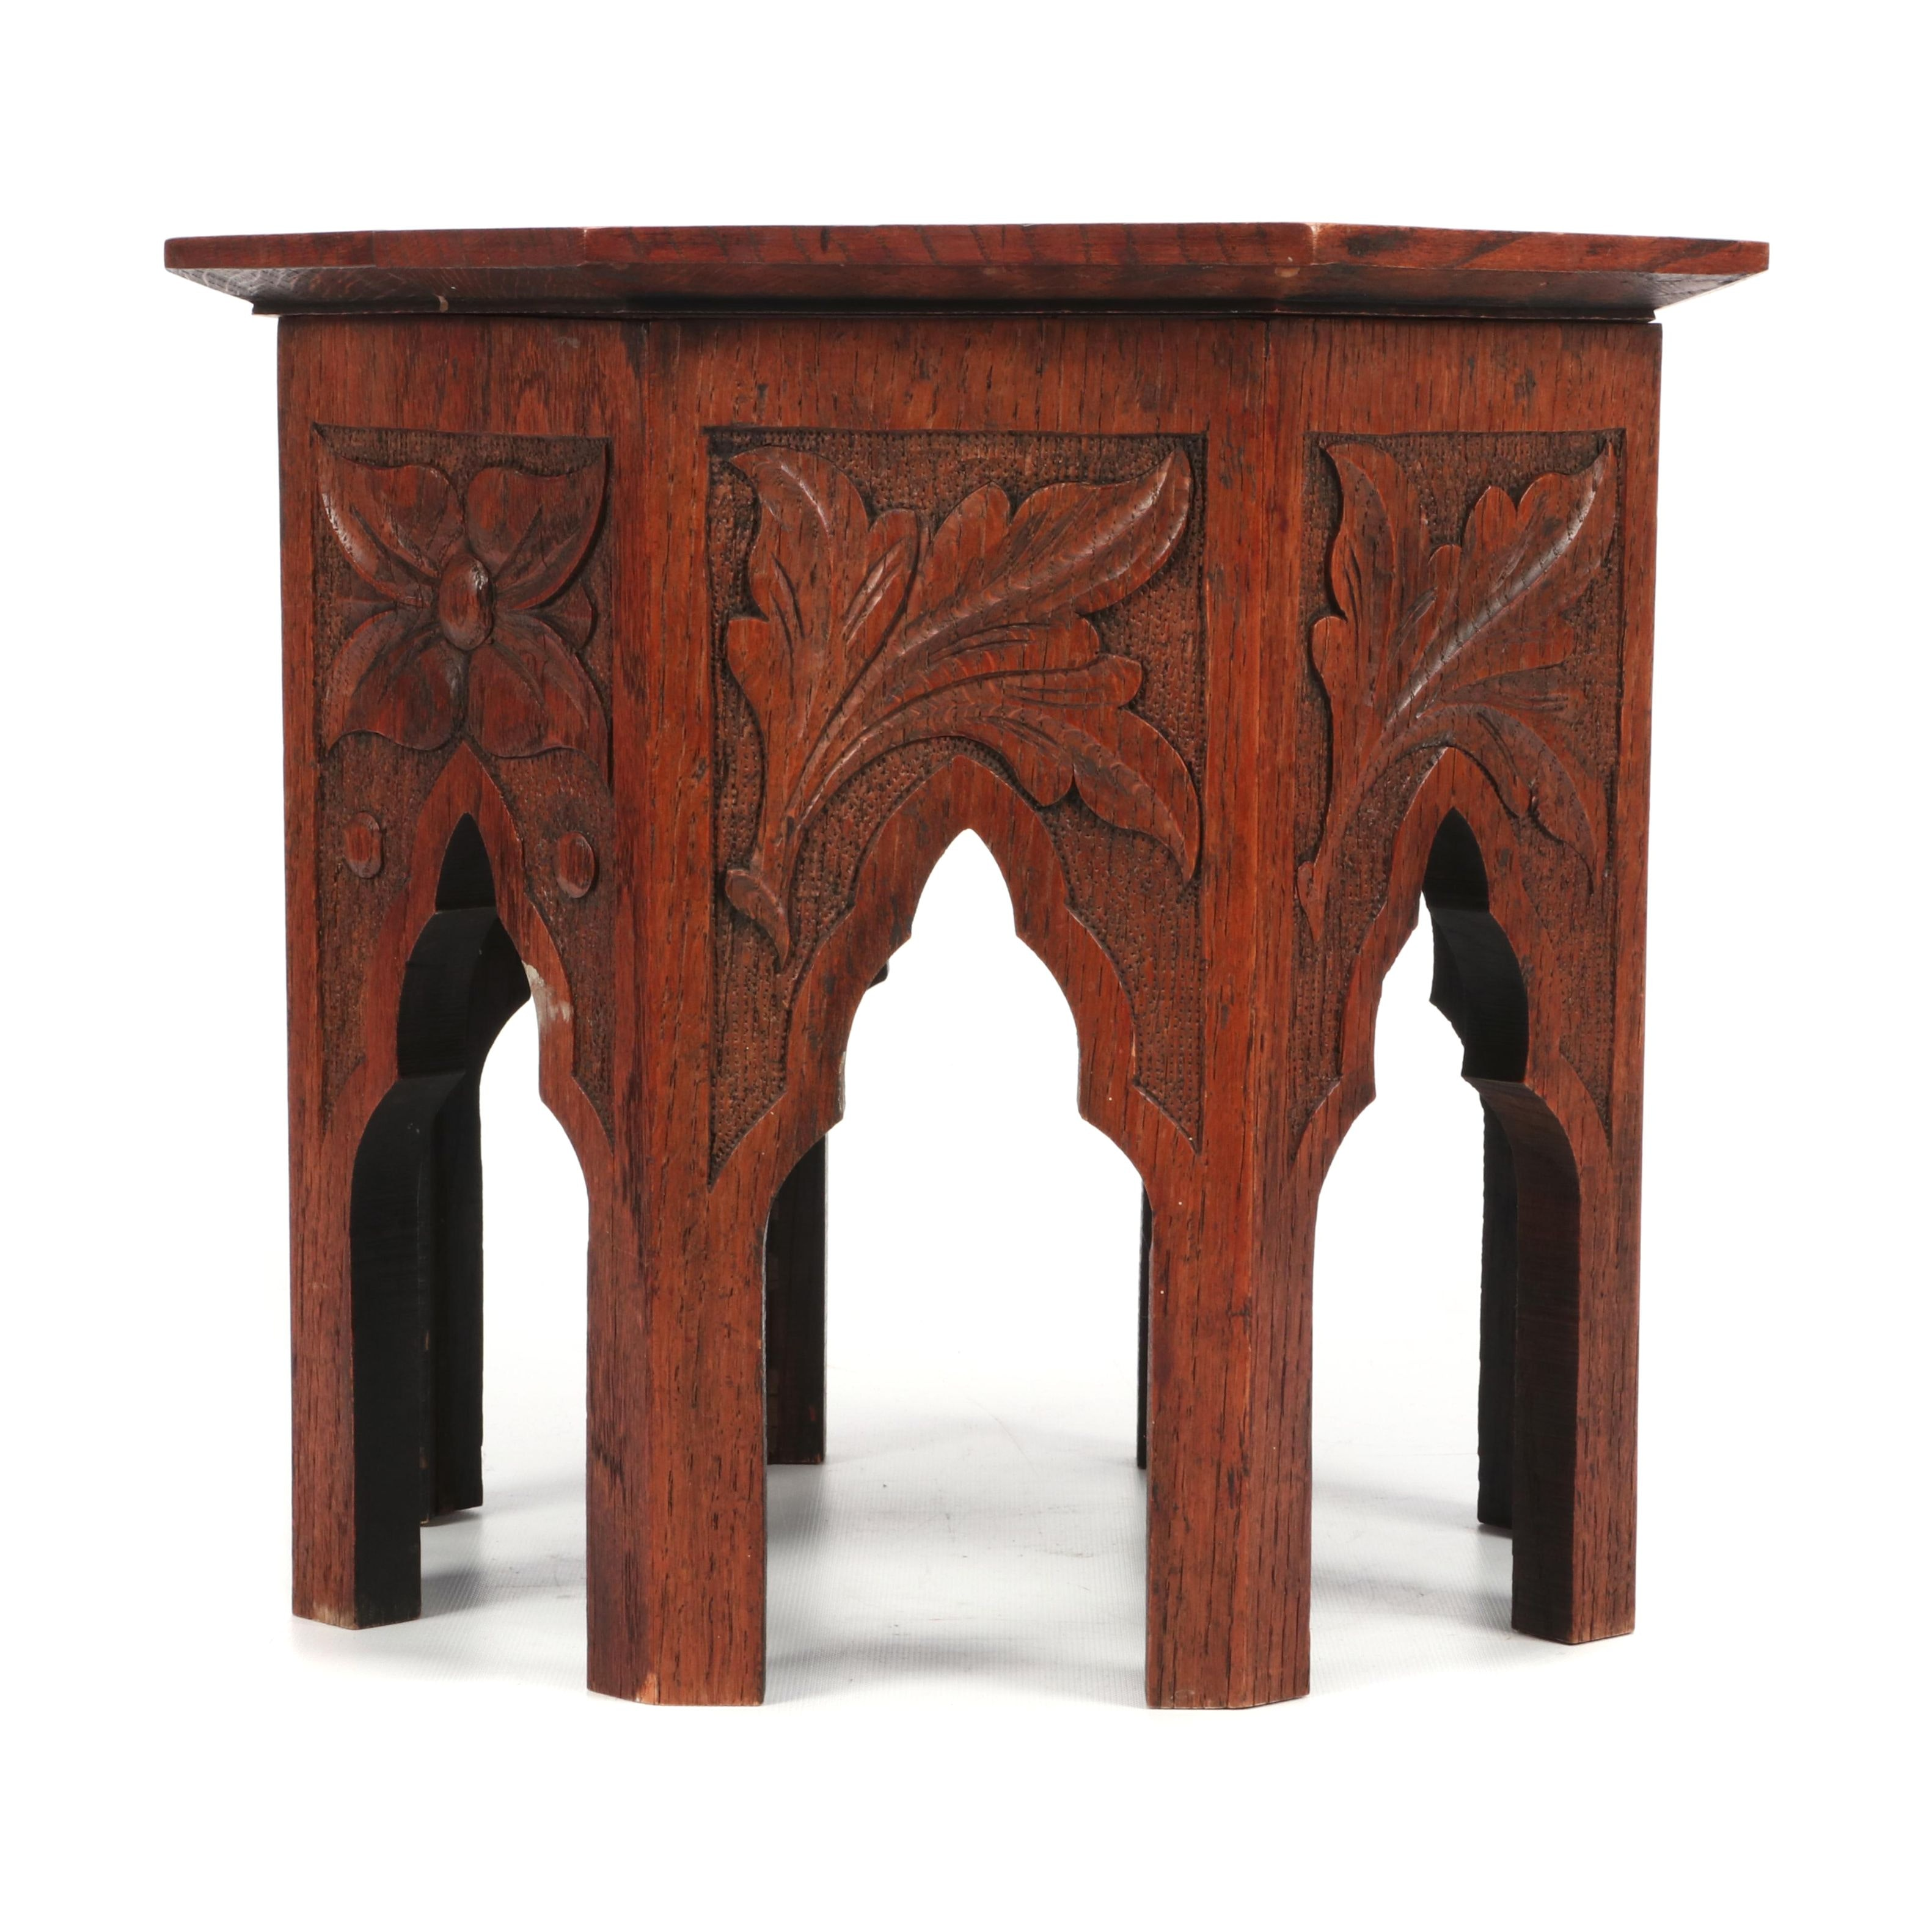 Cincinnati Art Carved Oak Low Table with Monogram, Late 19th Century